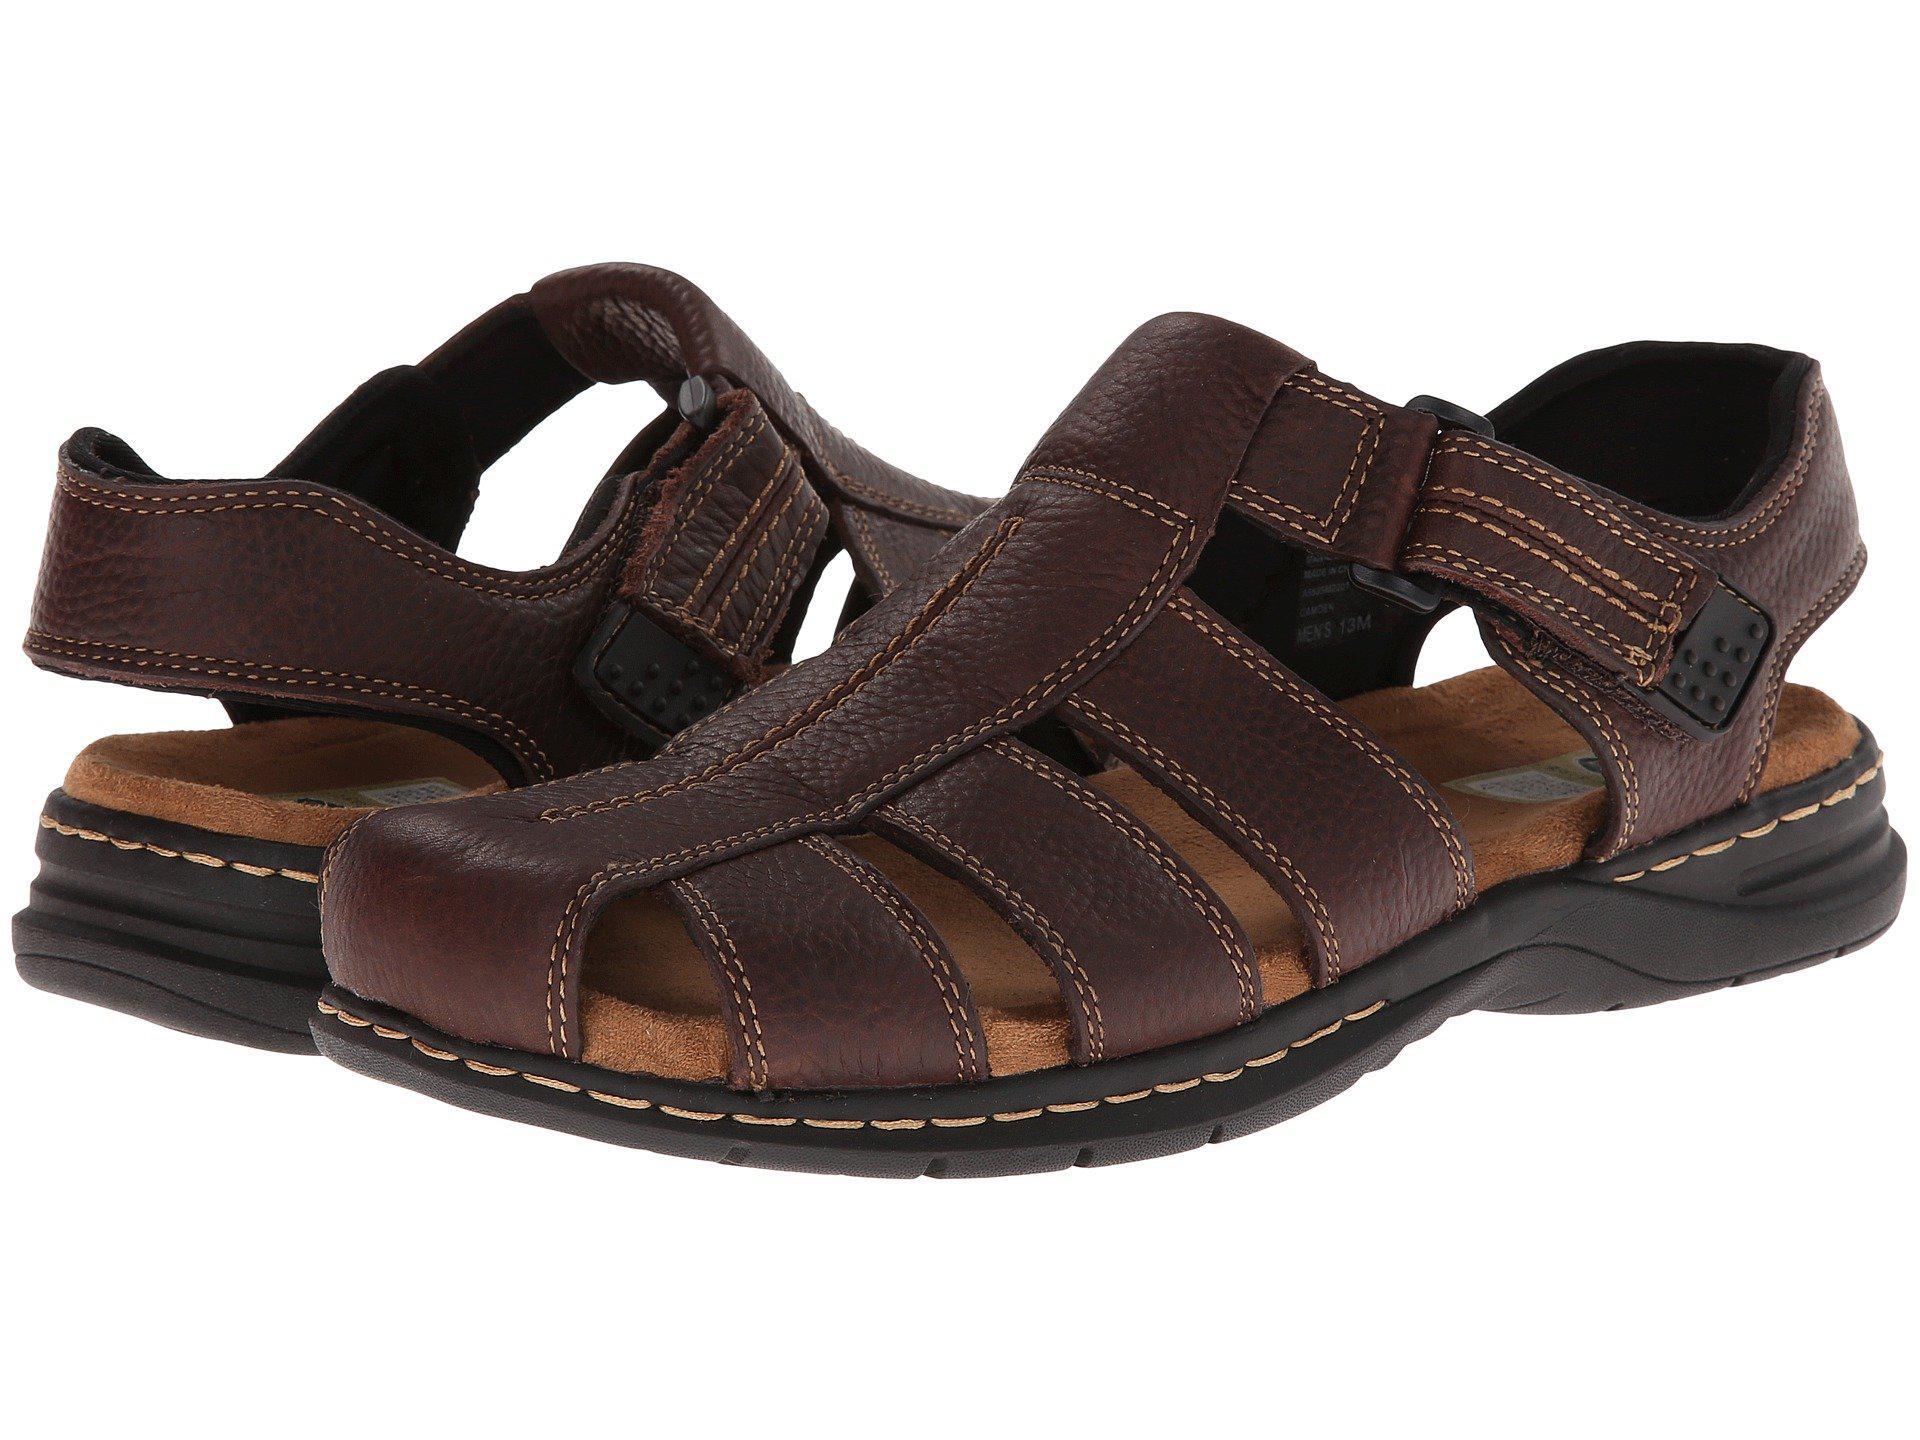 b6d939a44d82 Lyst - Dr. Scholls Gaston (briar Brown) Men s Sandals in Brown for ...